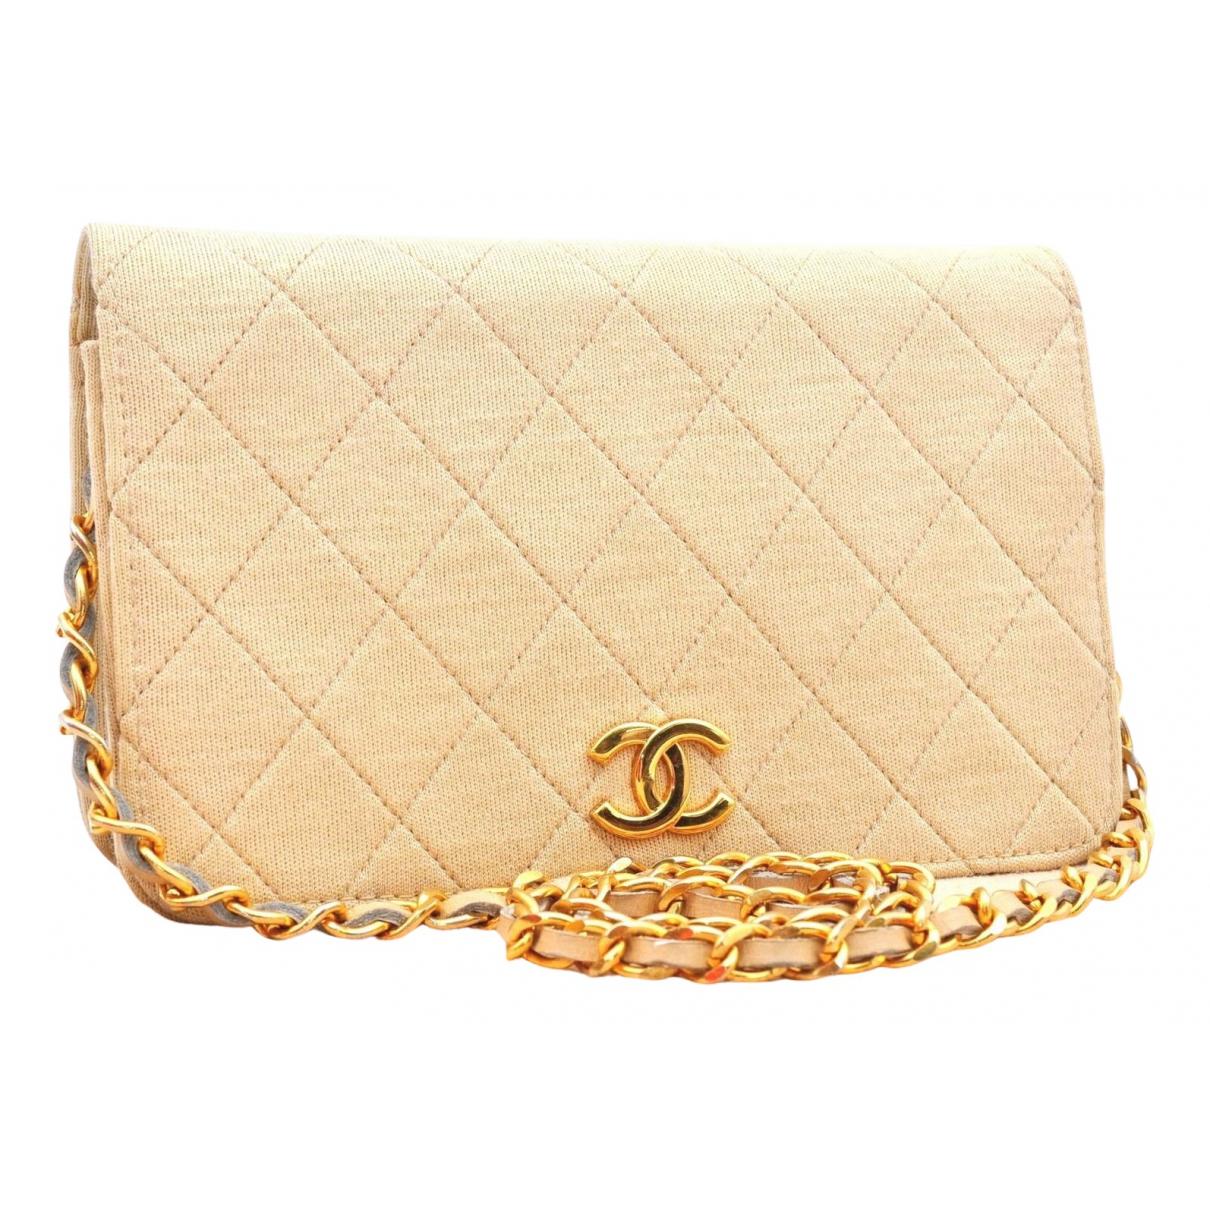 Chanel Timeless/Classique Handtasche in  Beige Leinen